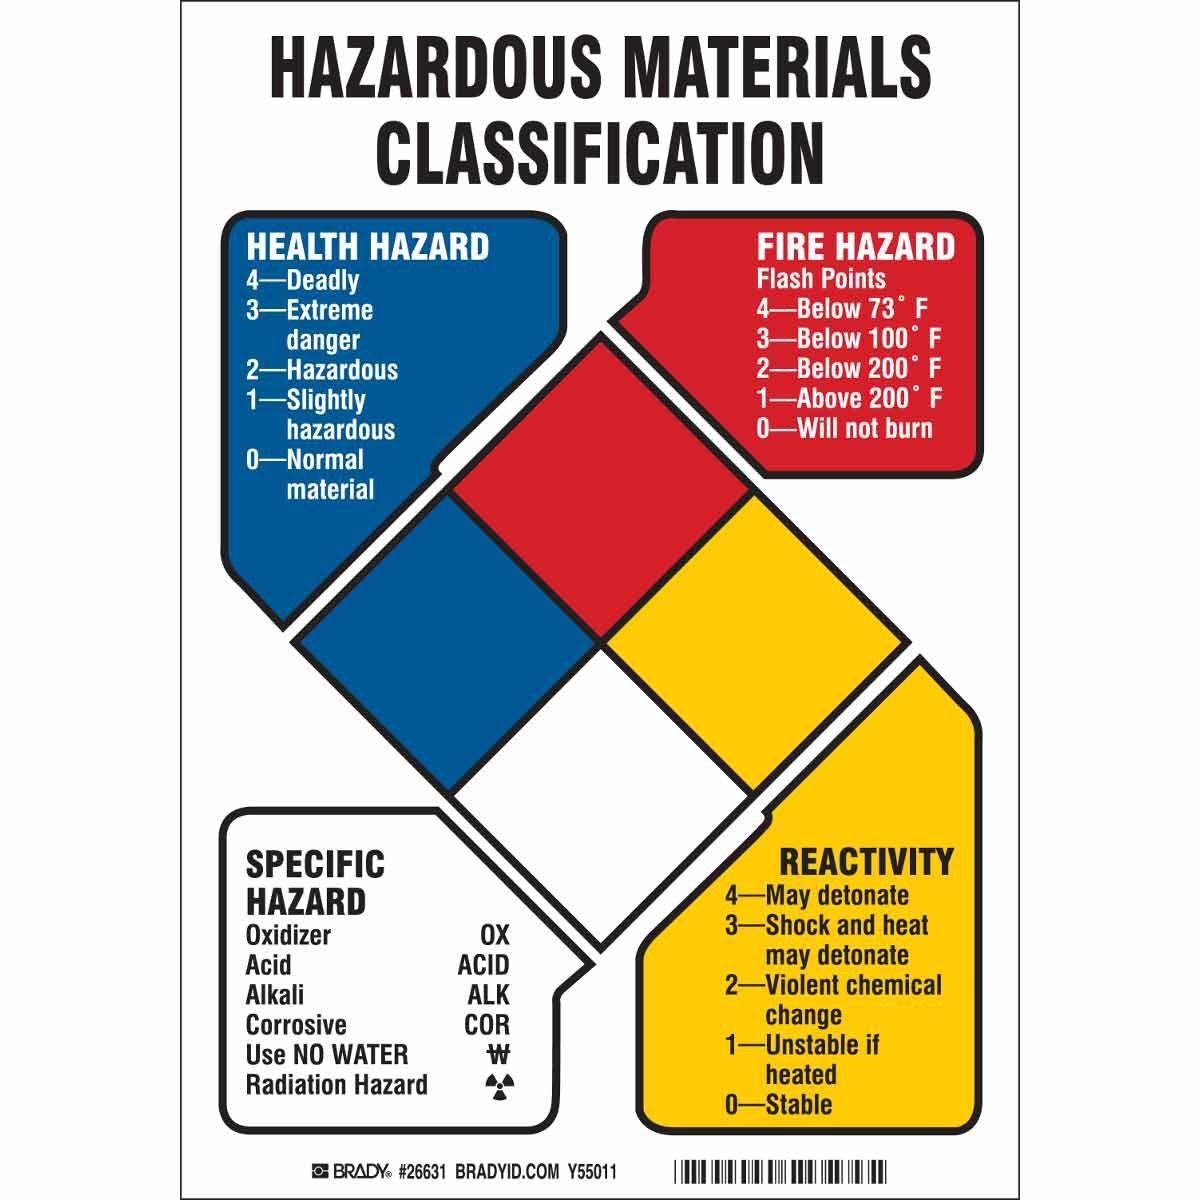 Hazardous Materials Classification Hazardous Materials Field Guide Reading